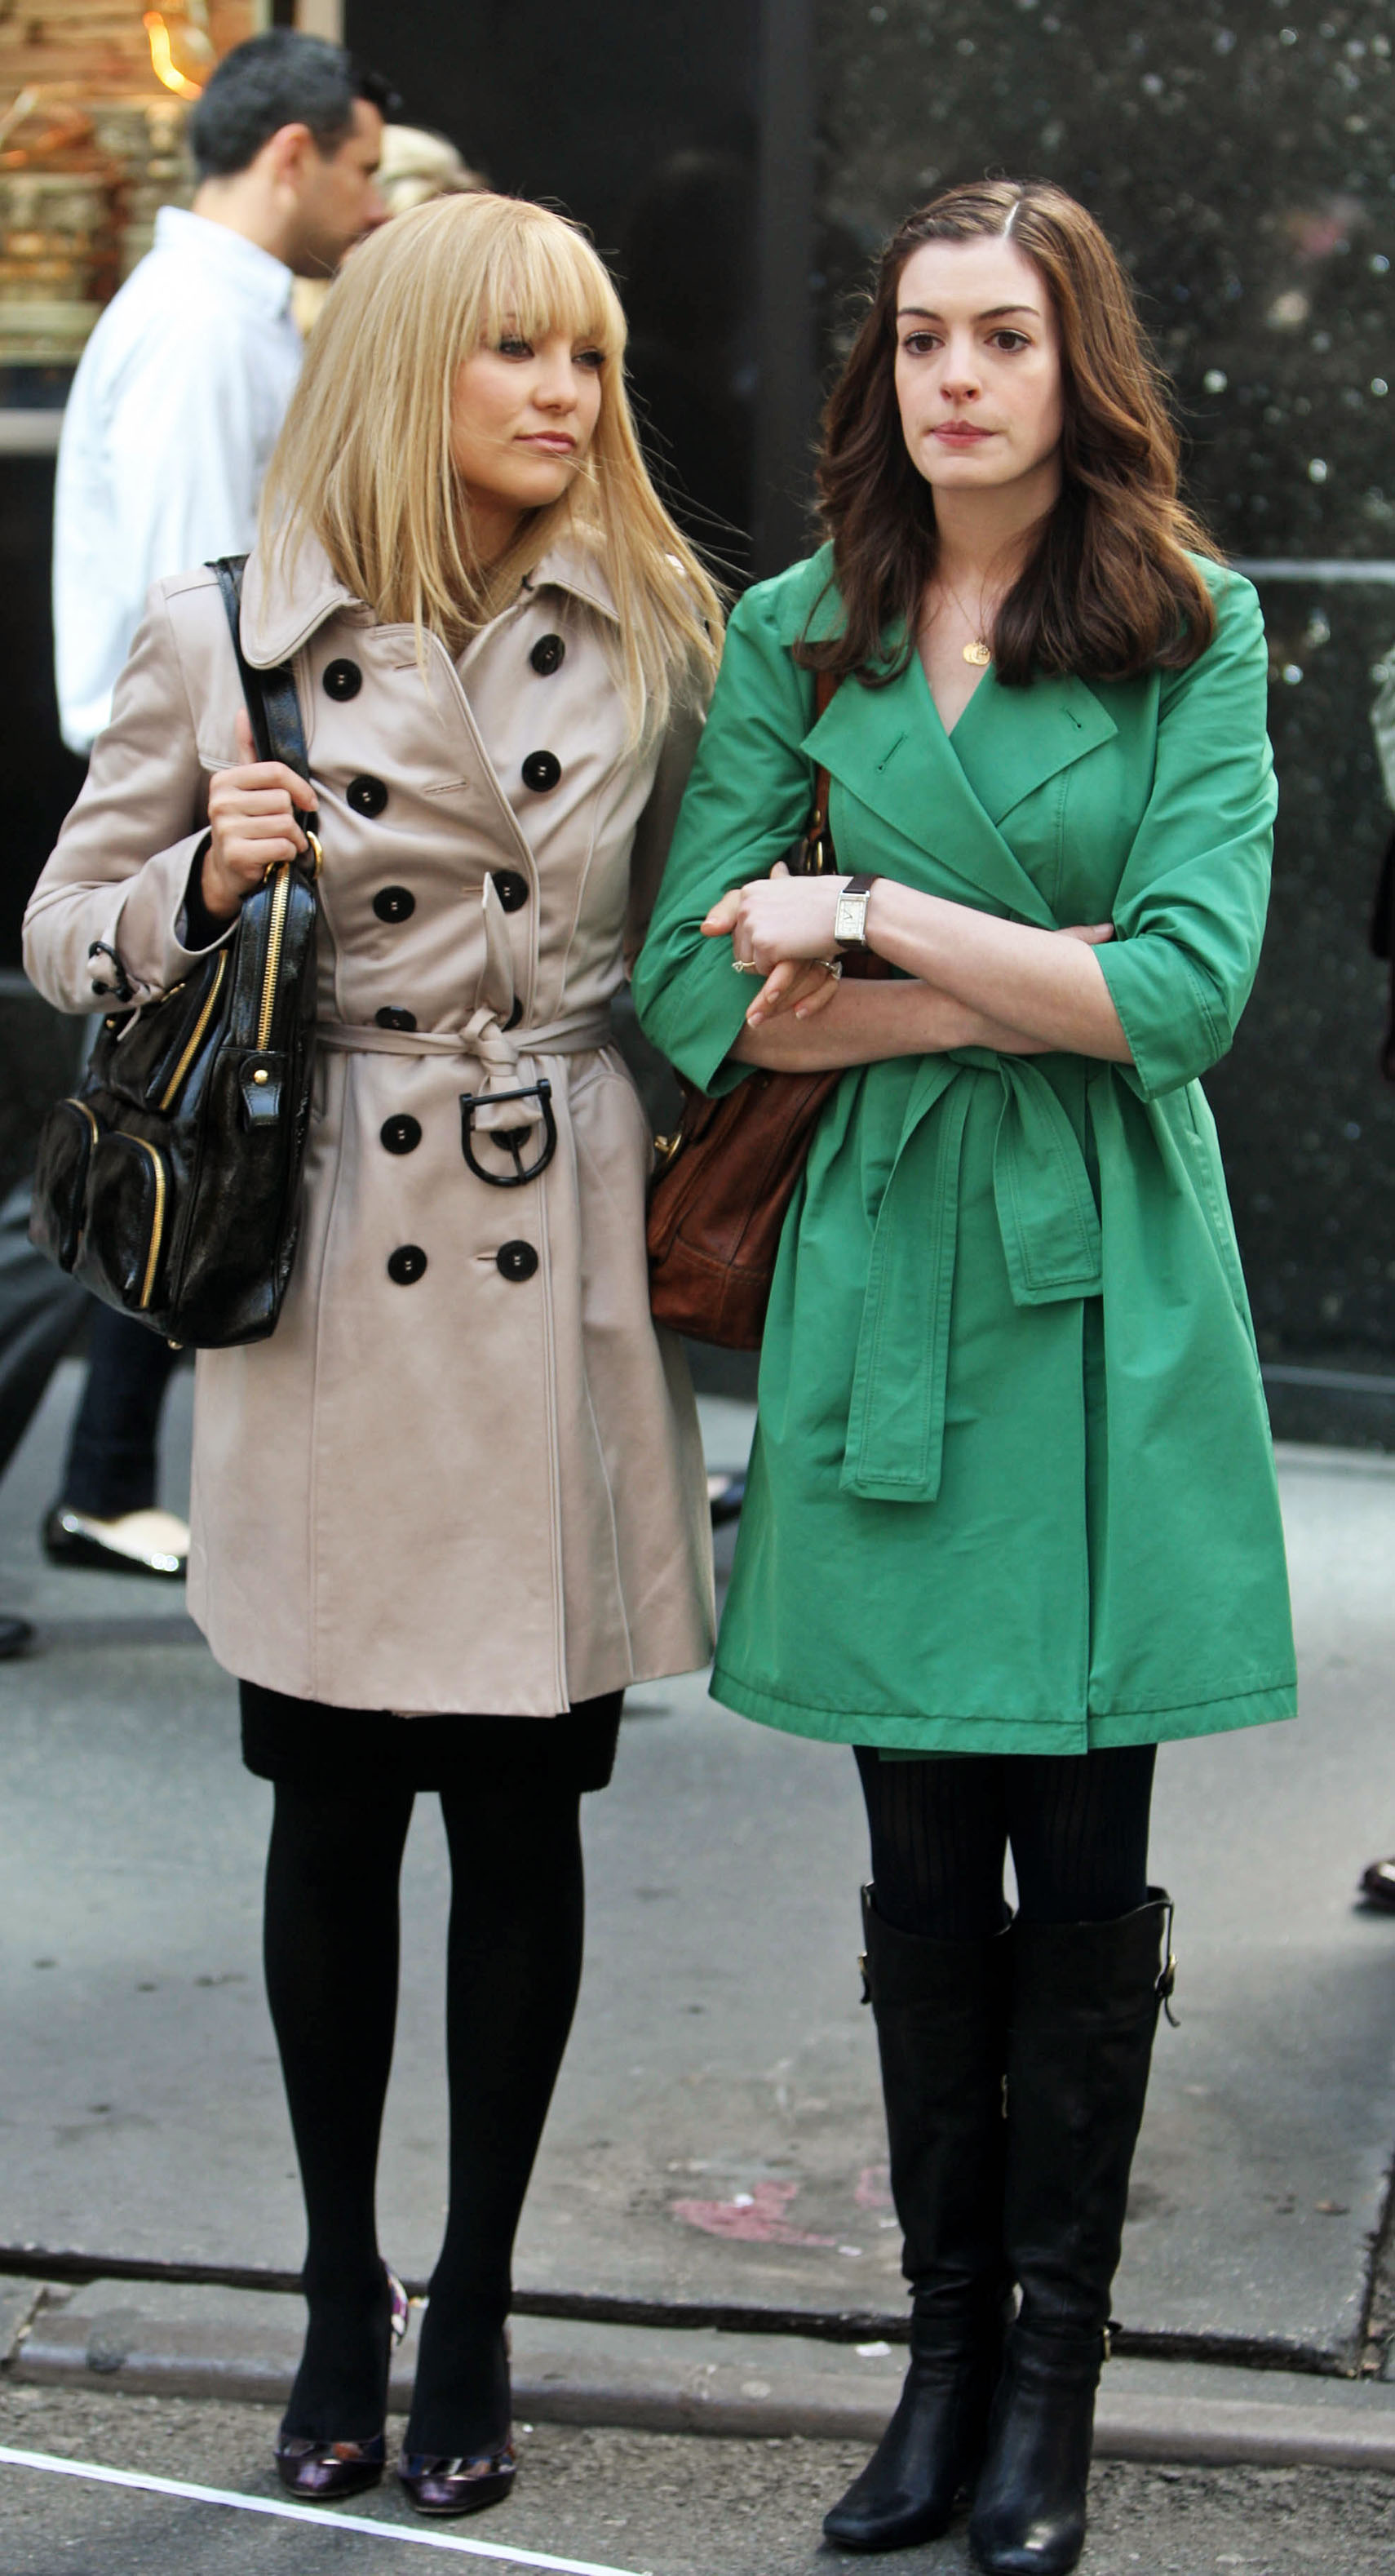 73106_celeb-city.org_Kate_Hudson_Anne_Hathaway_candid_on_the_set_of_Bride_Wars_05-28-2008_002_123_899lo.jpg